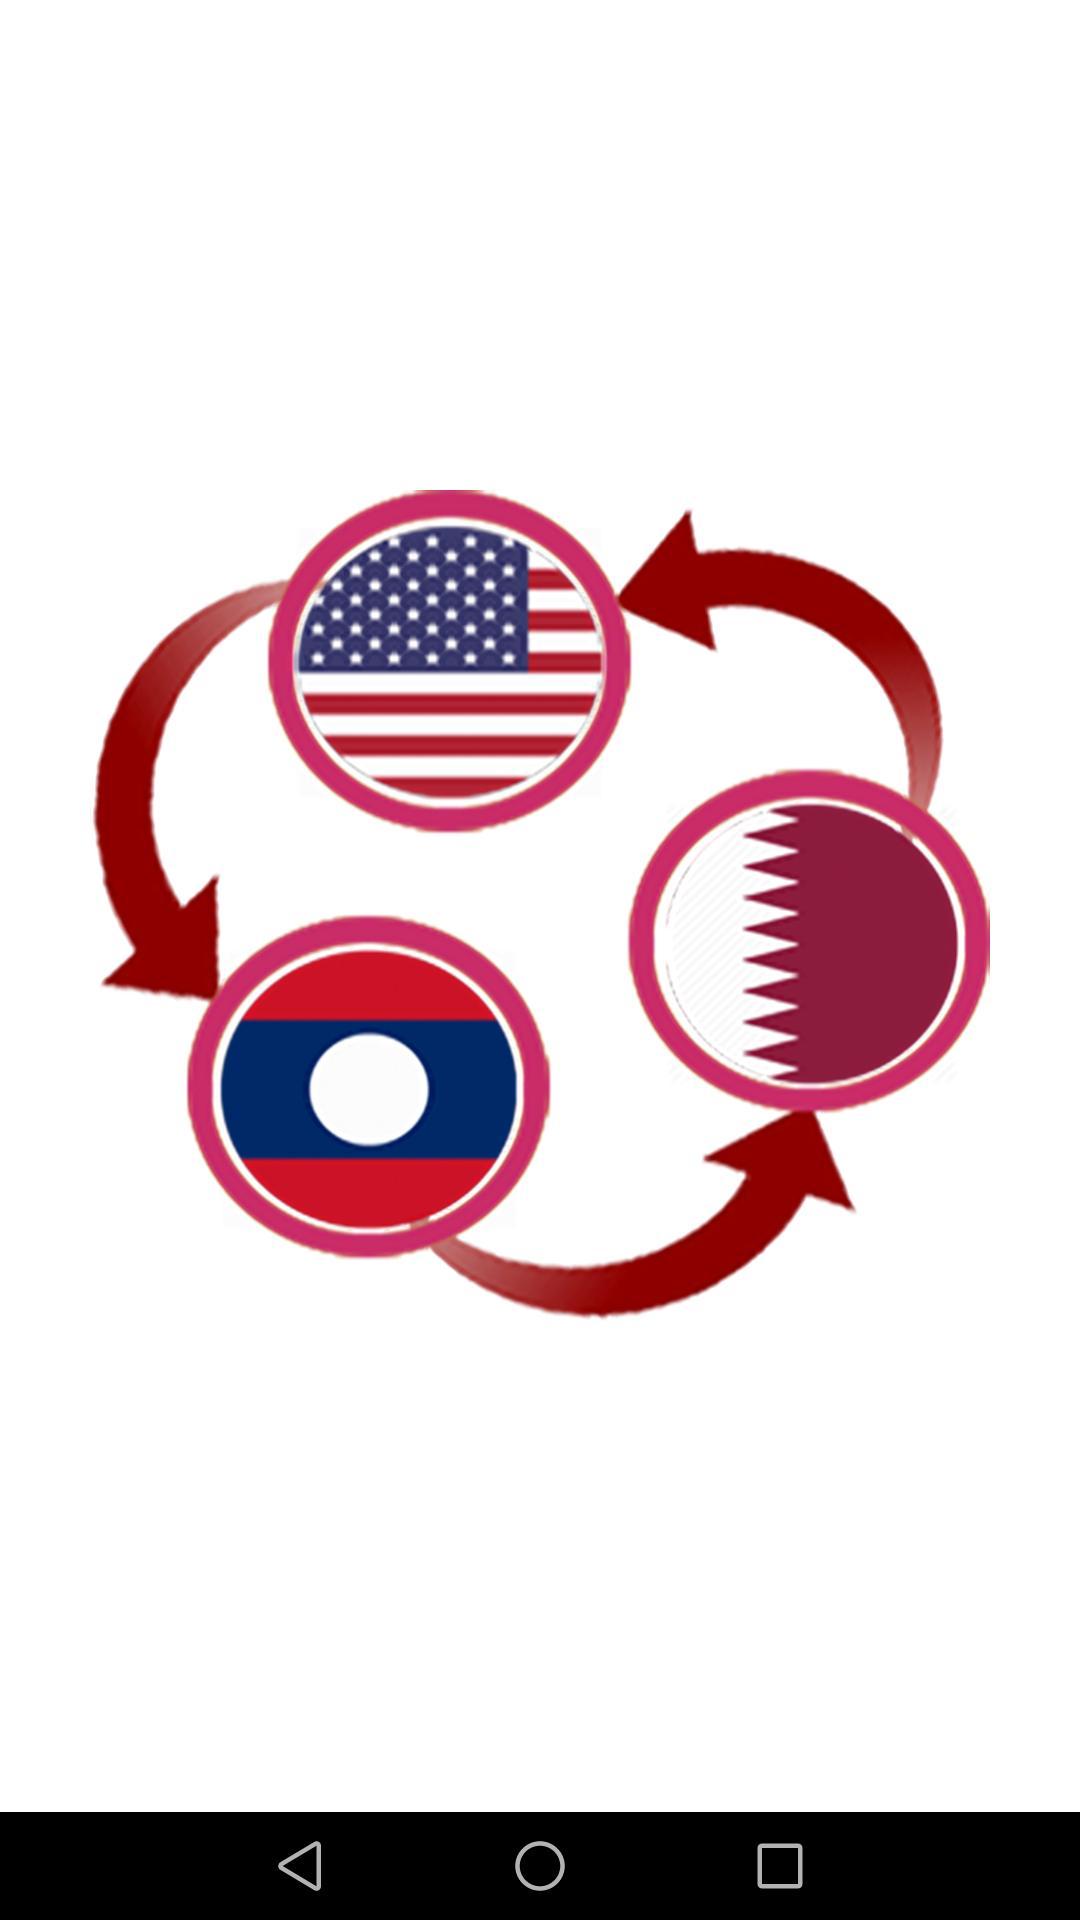 Us Dollar To Lao Kip And Qatari Riyal